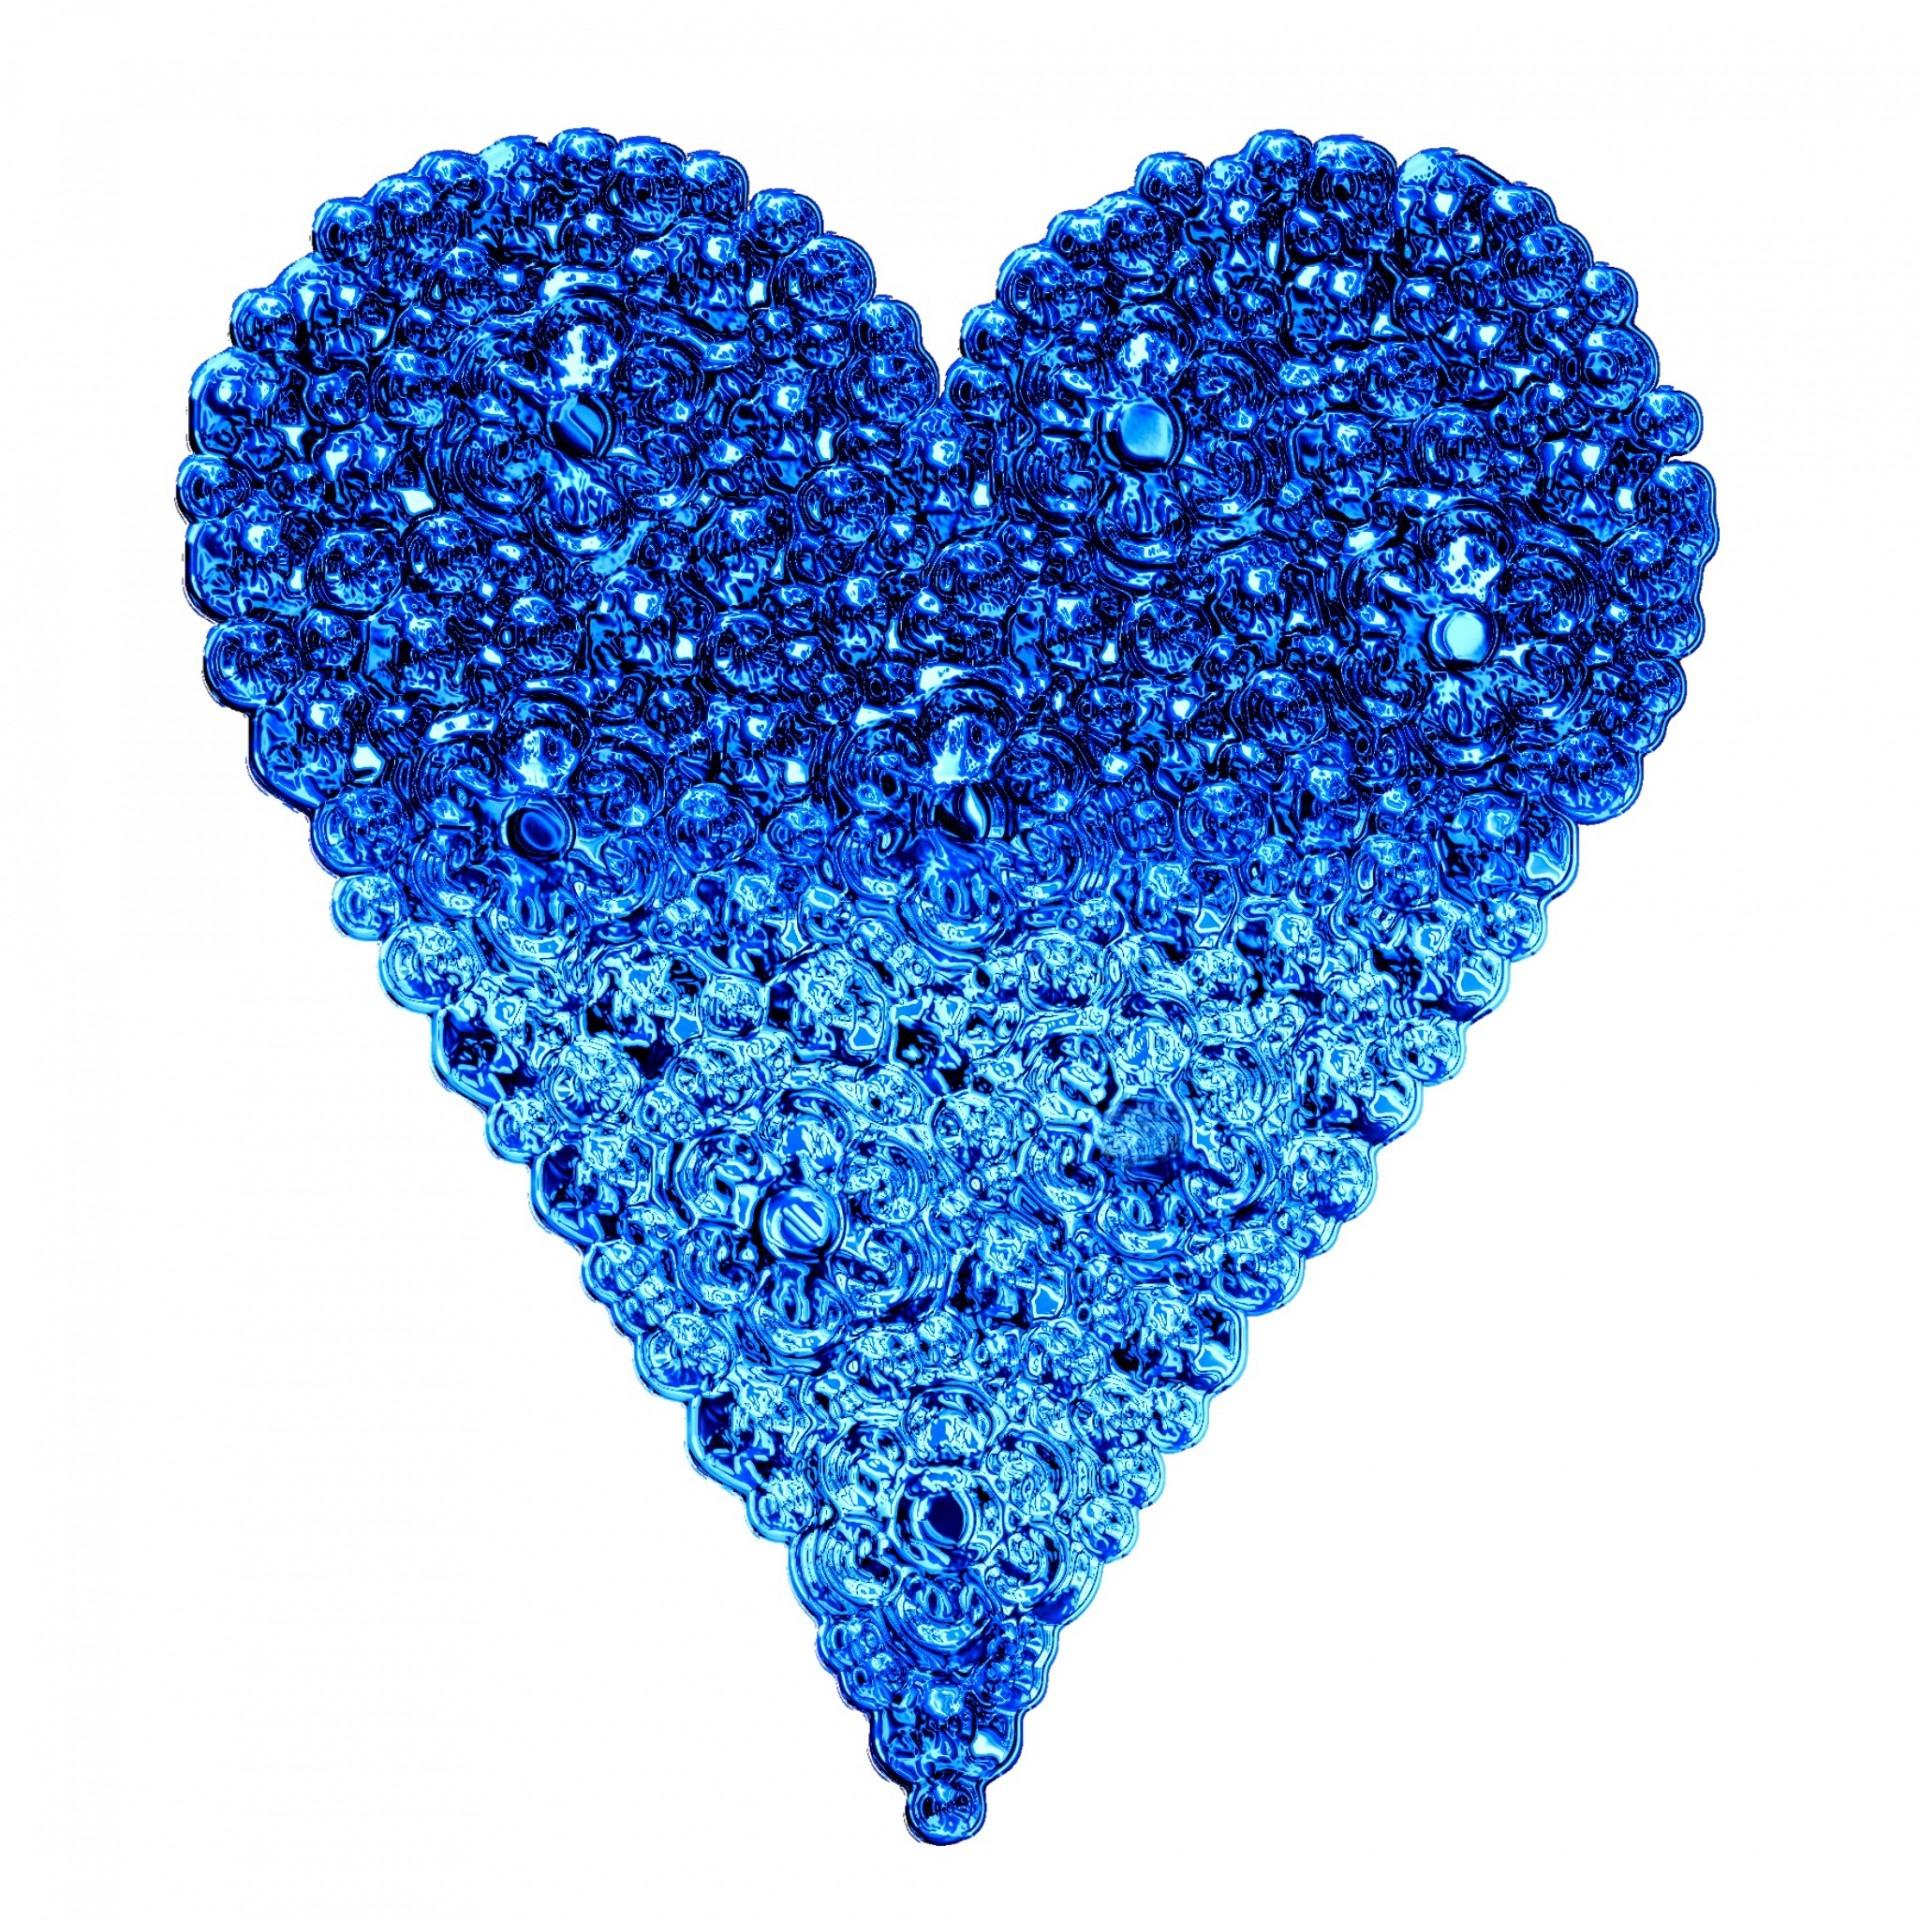 Gambar Bercahaya Daun Bunga Jantung Pola Halus Percintaan